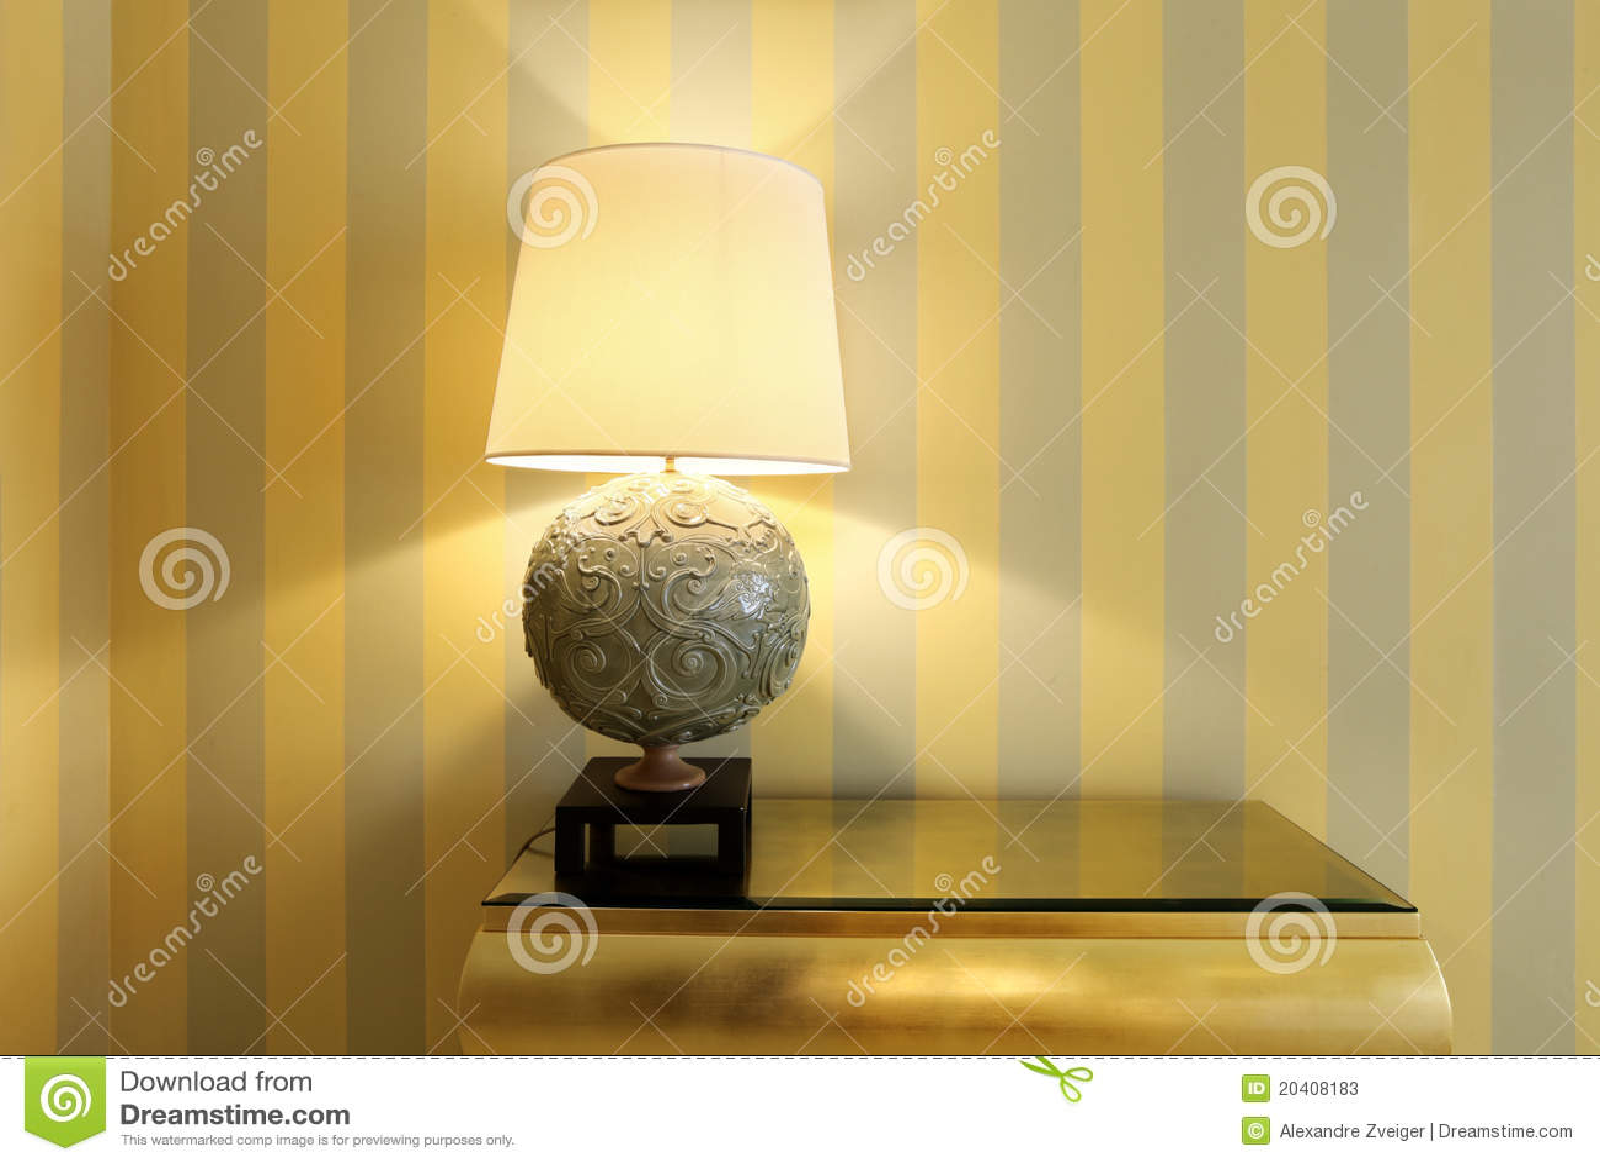 таблица комнаты светильника детали